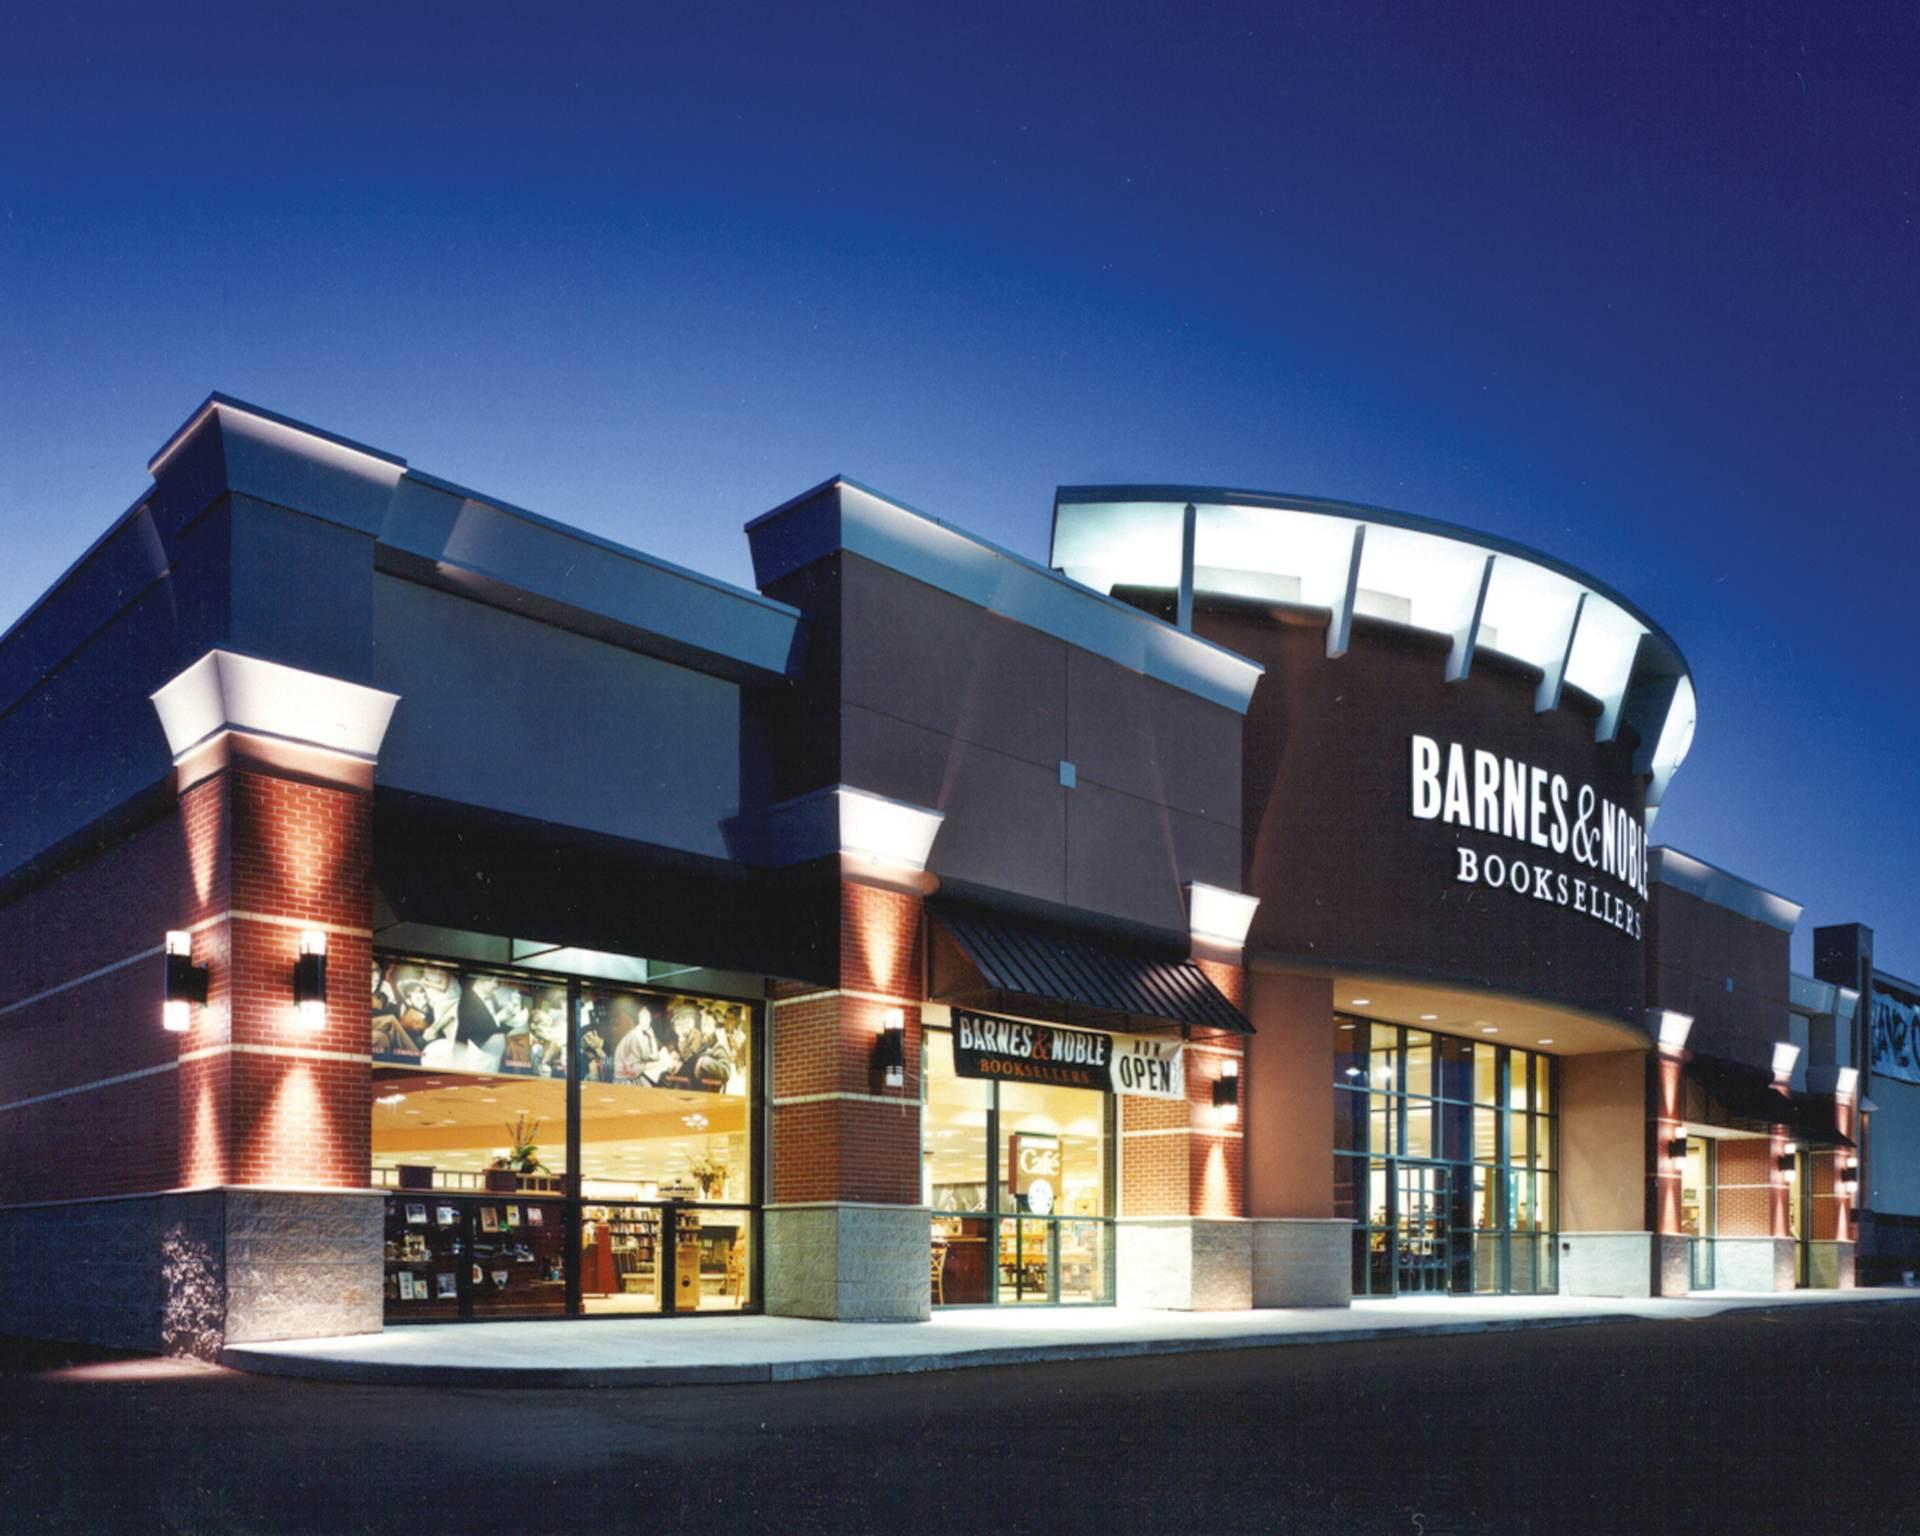 Barnes--Noble-8x10_1920x650Web.jpg